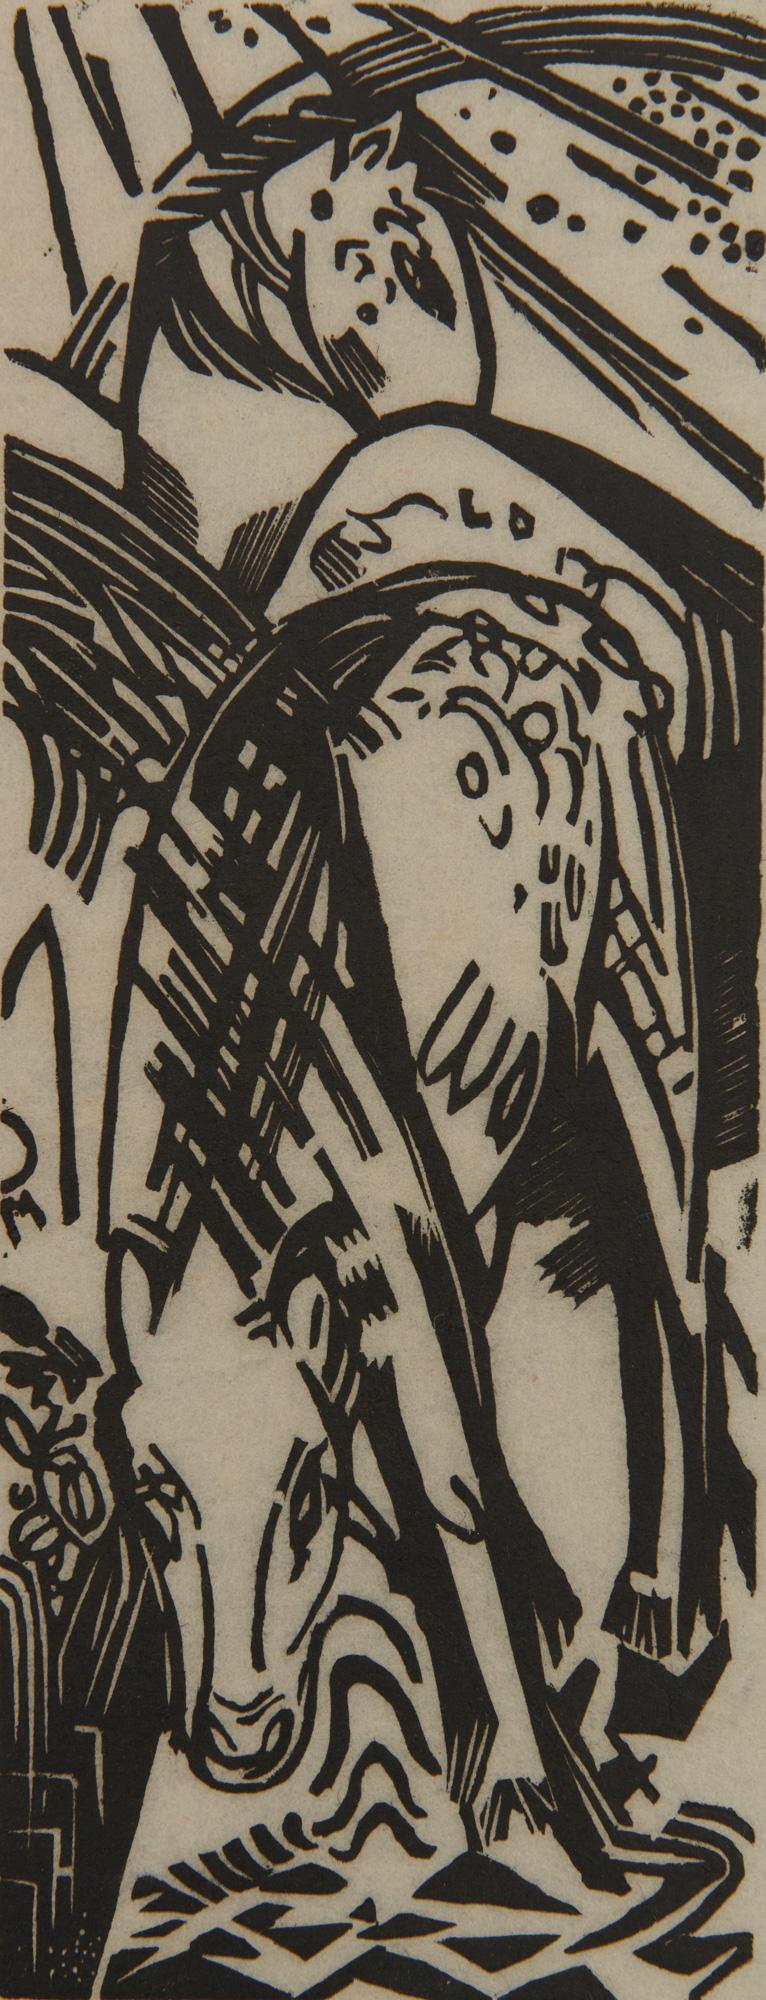 FRANZ MARC, (German, 1880-1916), Trinkendes Pferd (Drinking Horse), woodcut, 8 3/4 x 3 3/8 in.